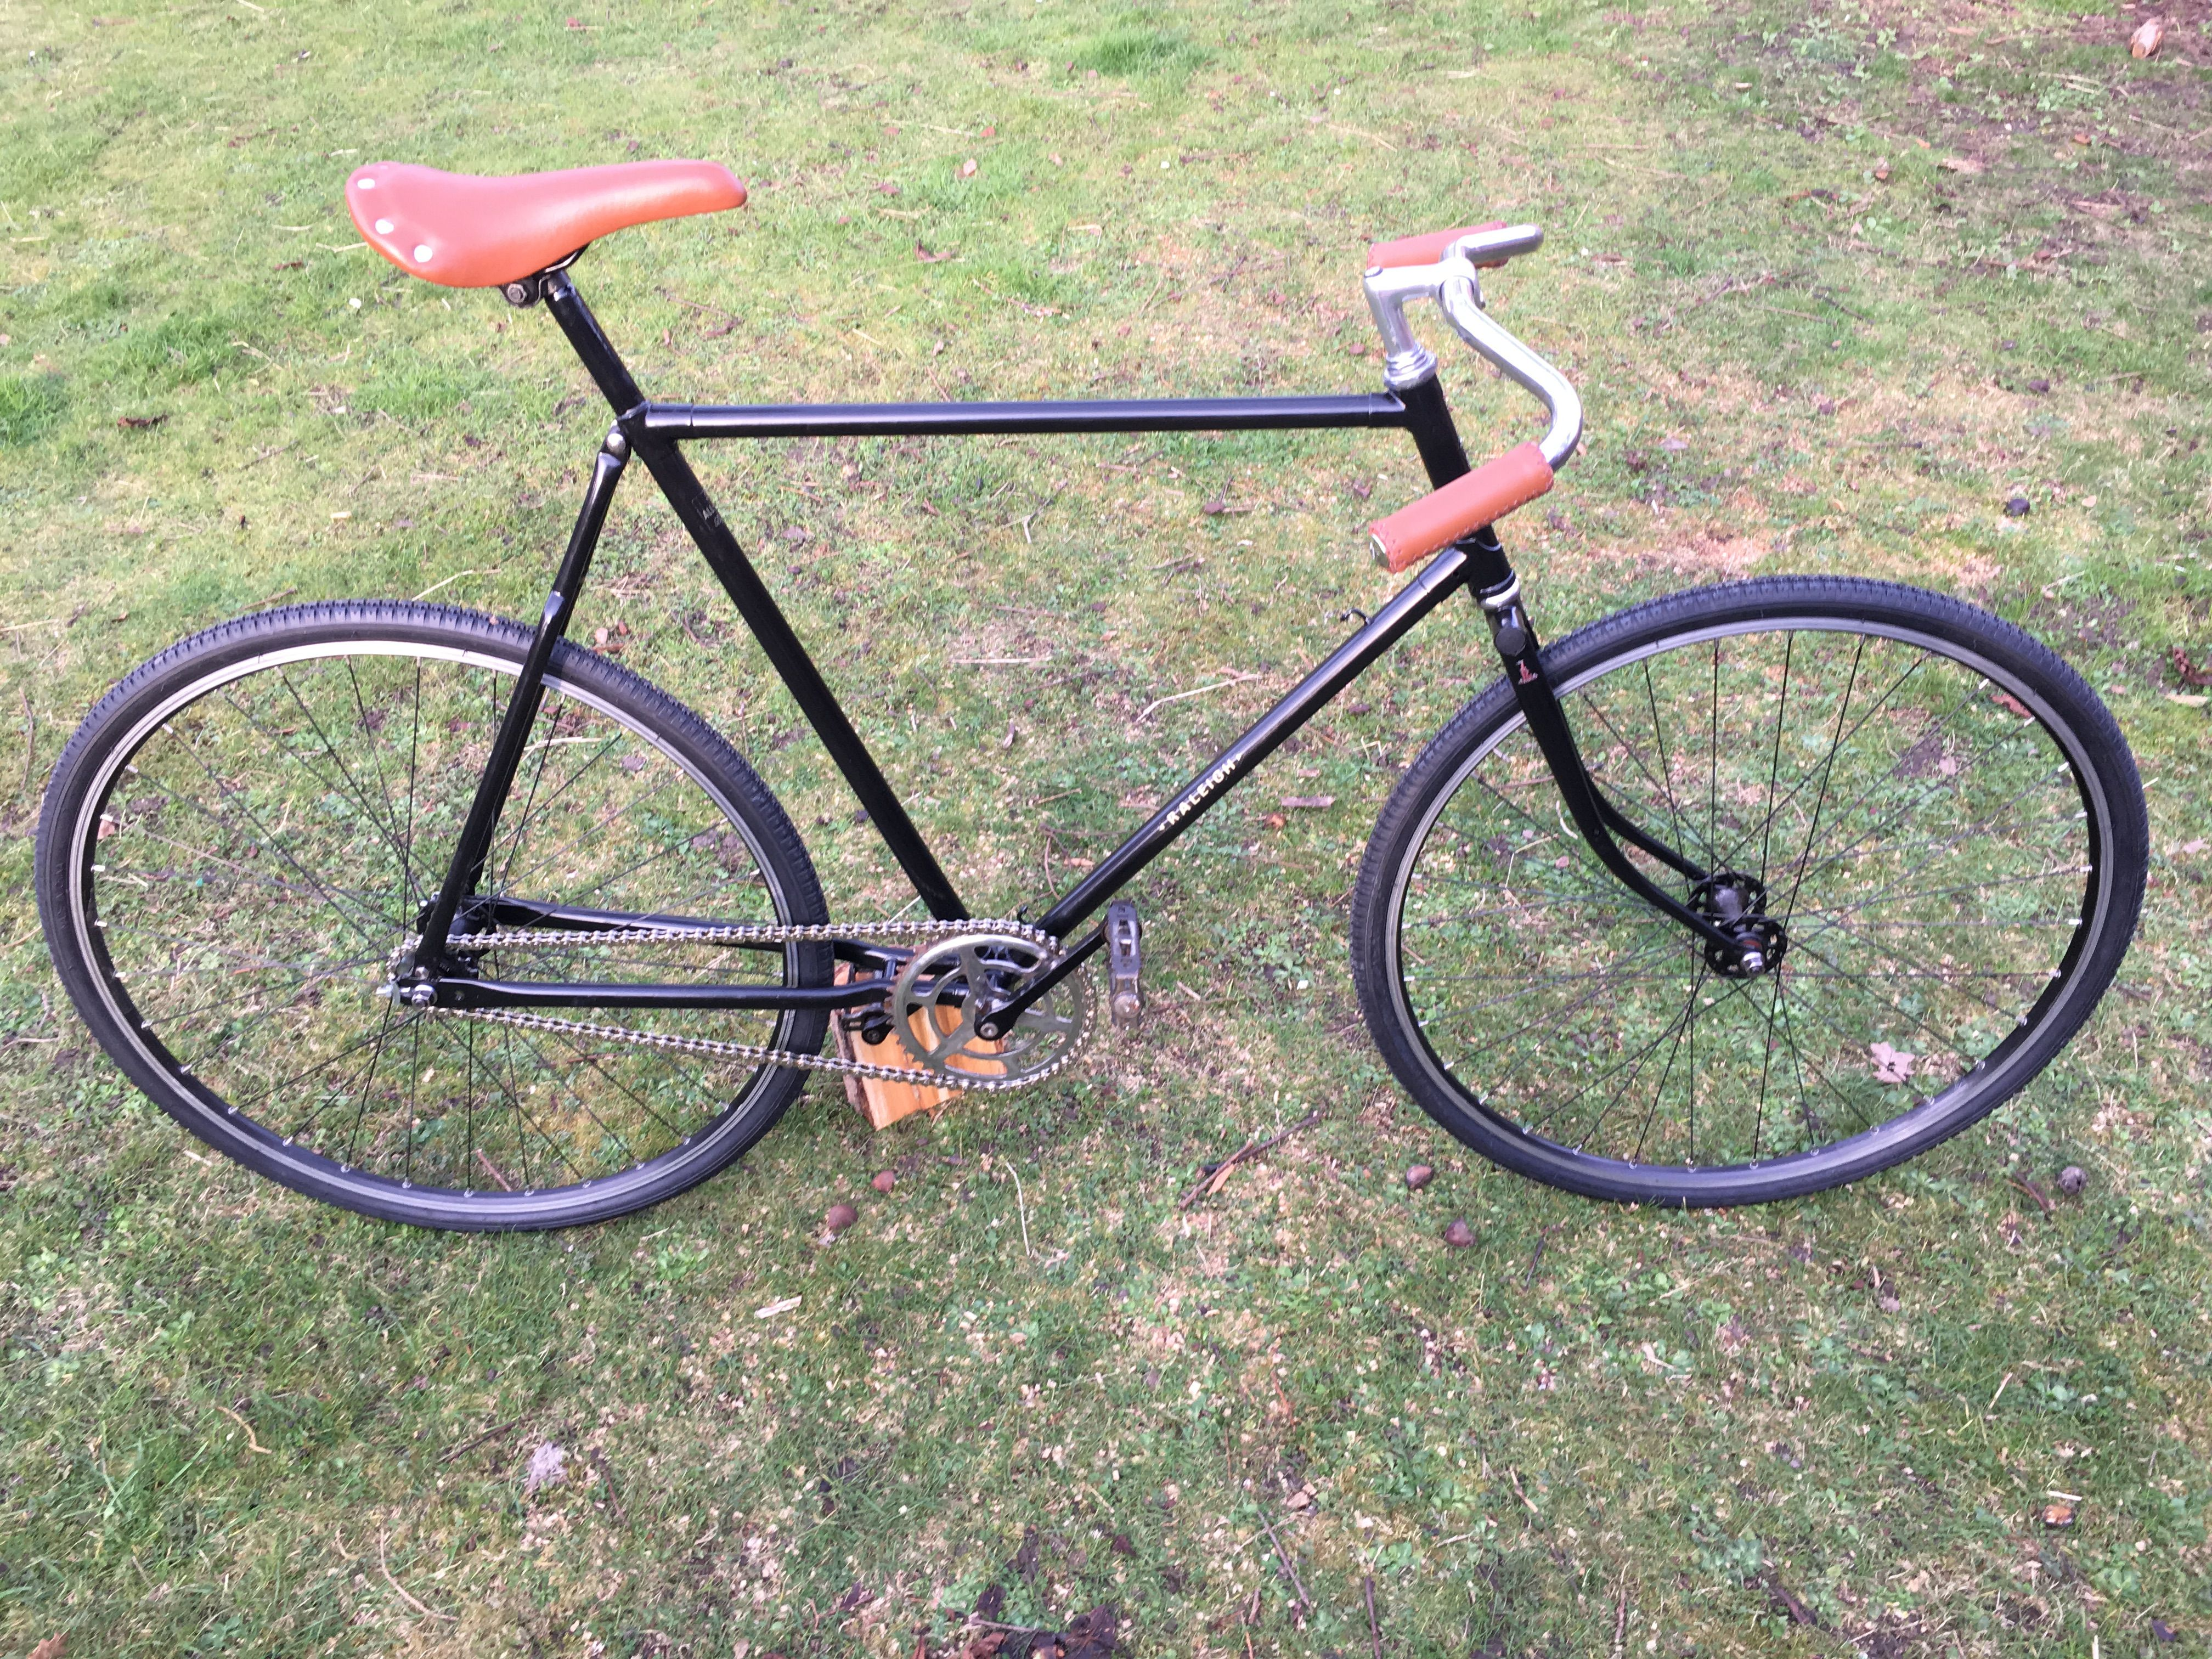 Vintage Path Racer. Retro rebuild/restore. Raleigh frame - Reynolds ...